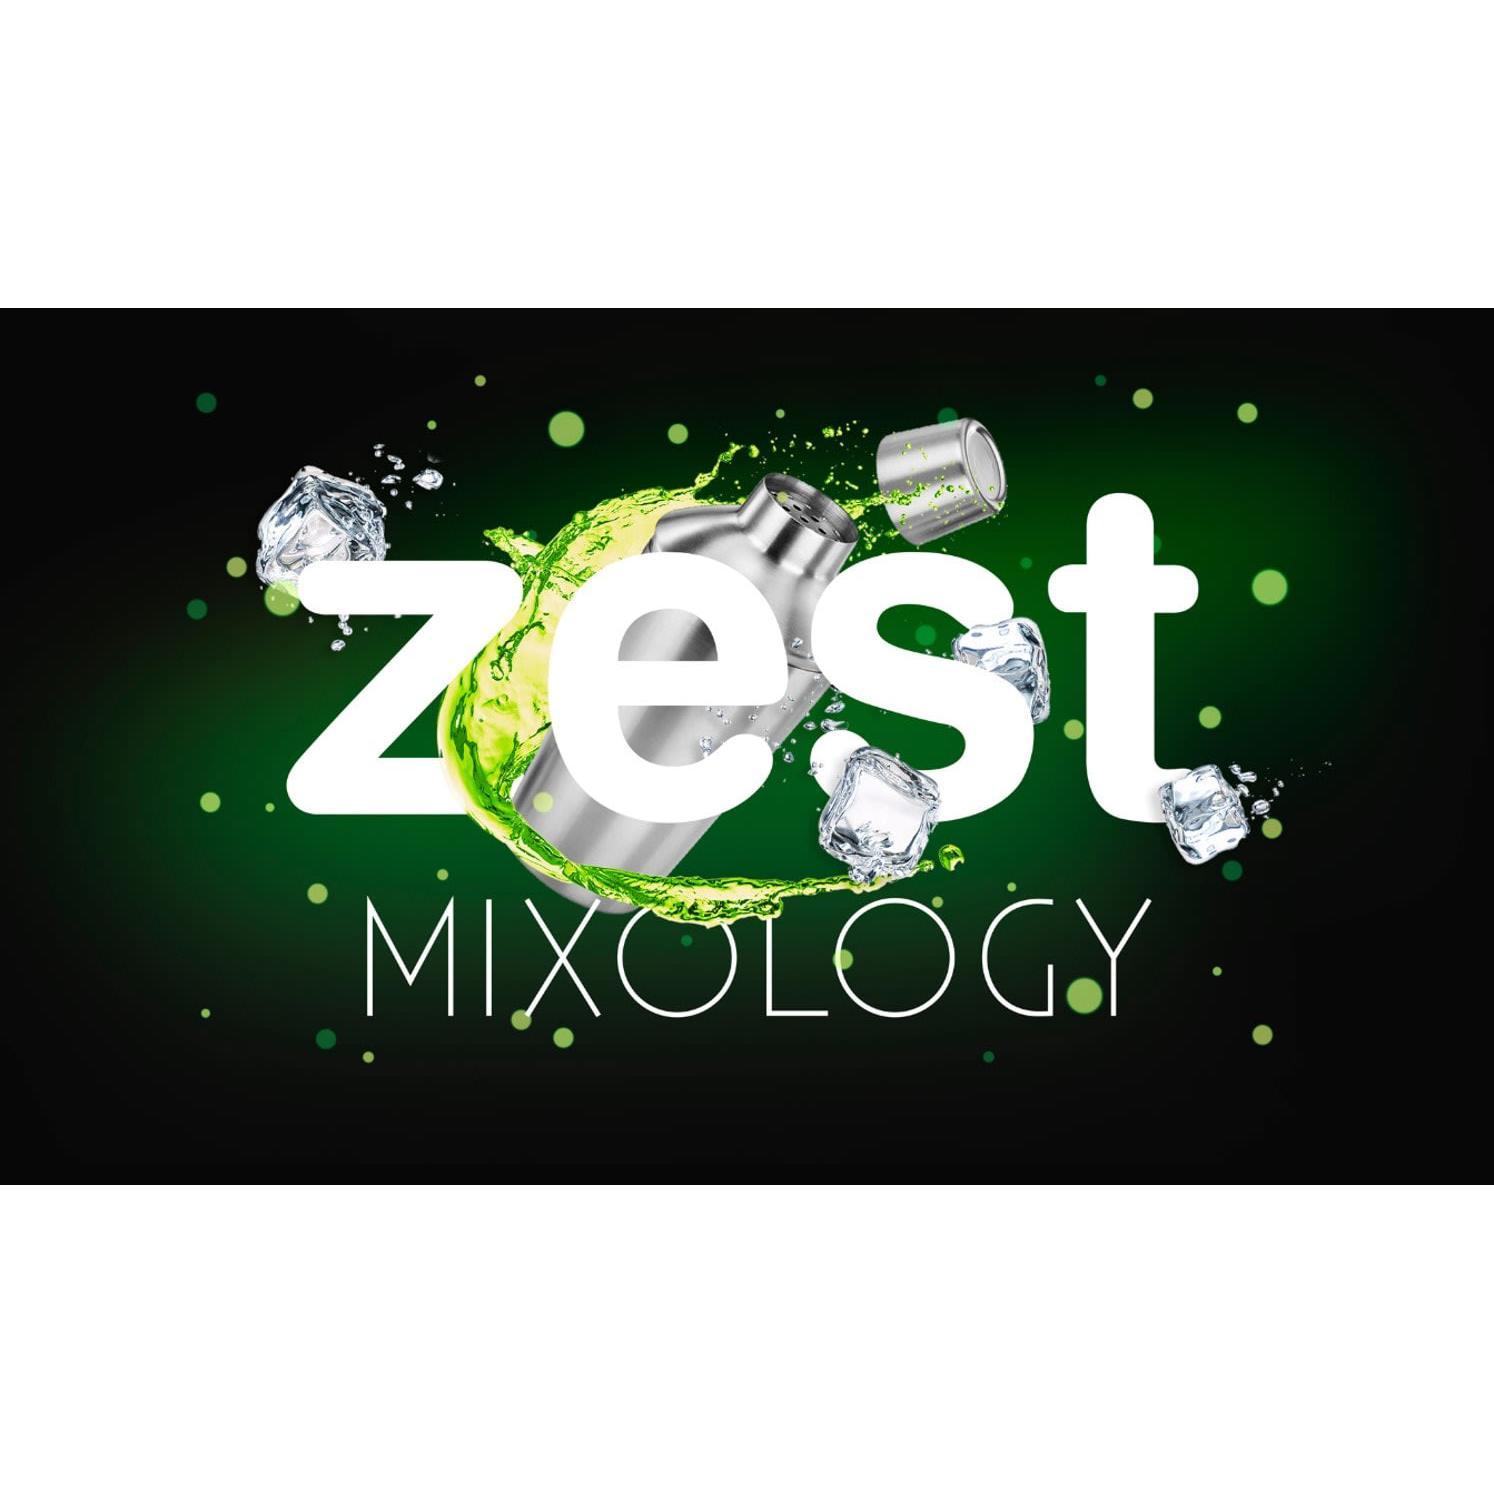 Zest Mixology - Leeds, West Yorkshire LS9 7AS - 01133 470025 | ShowMeLocal.com